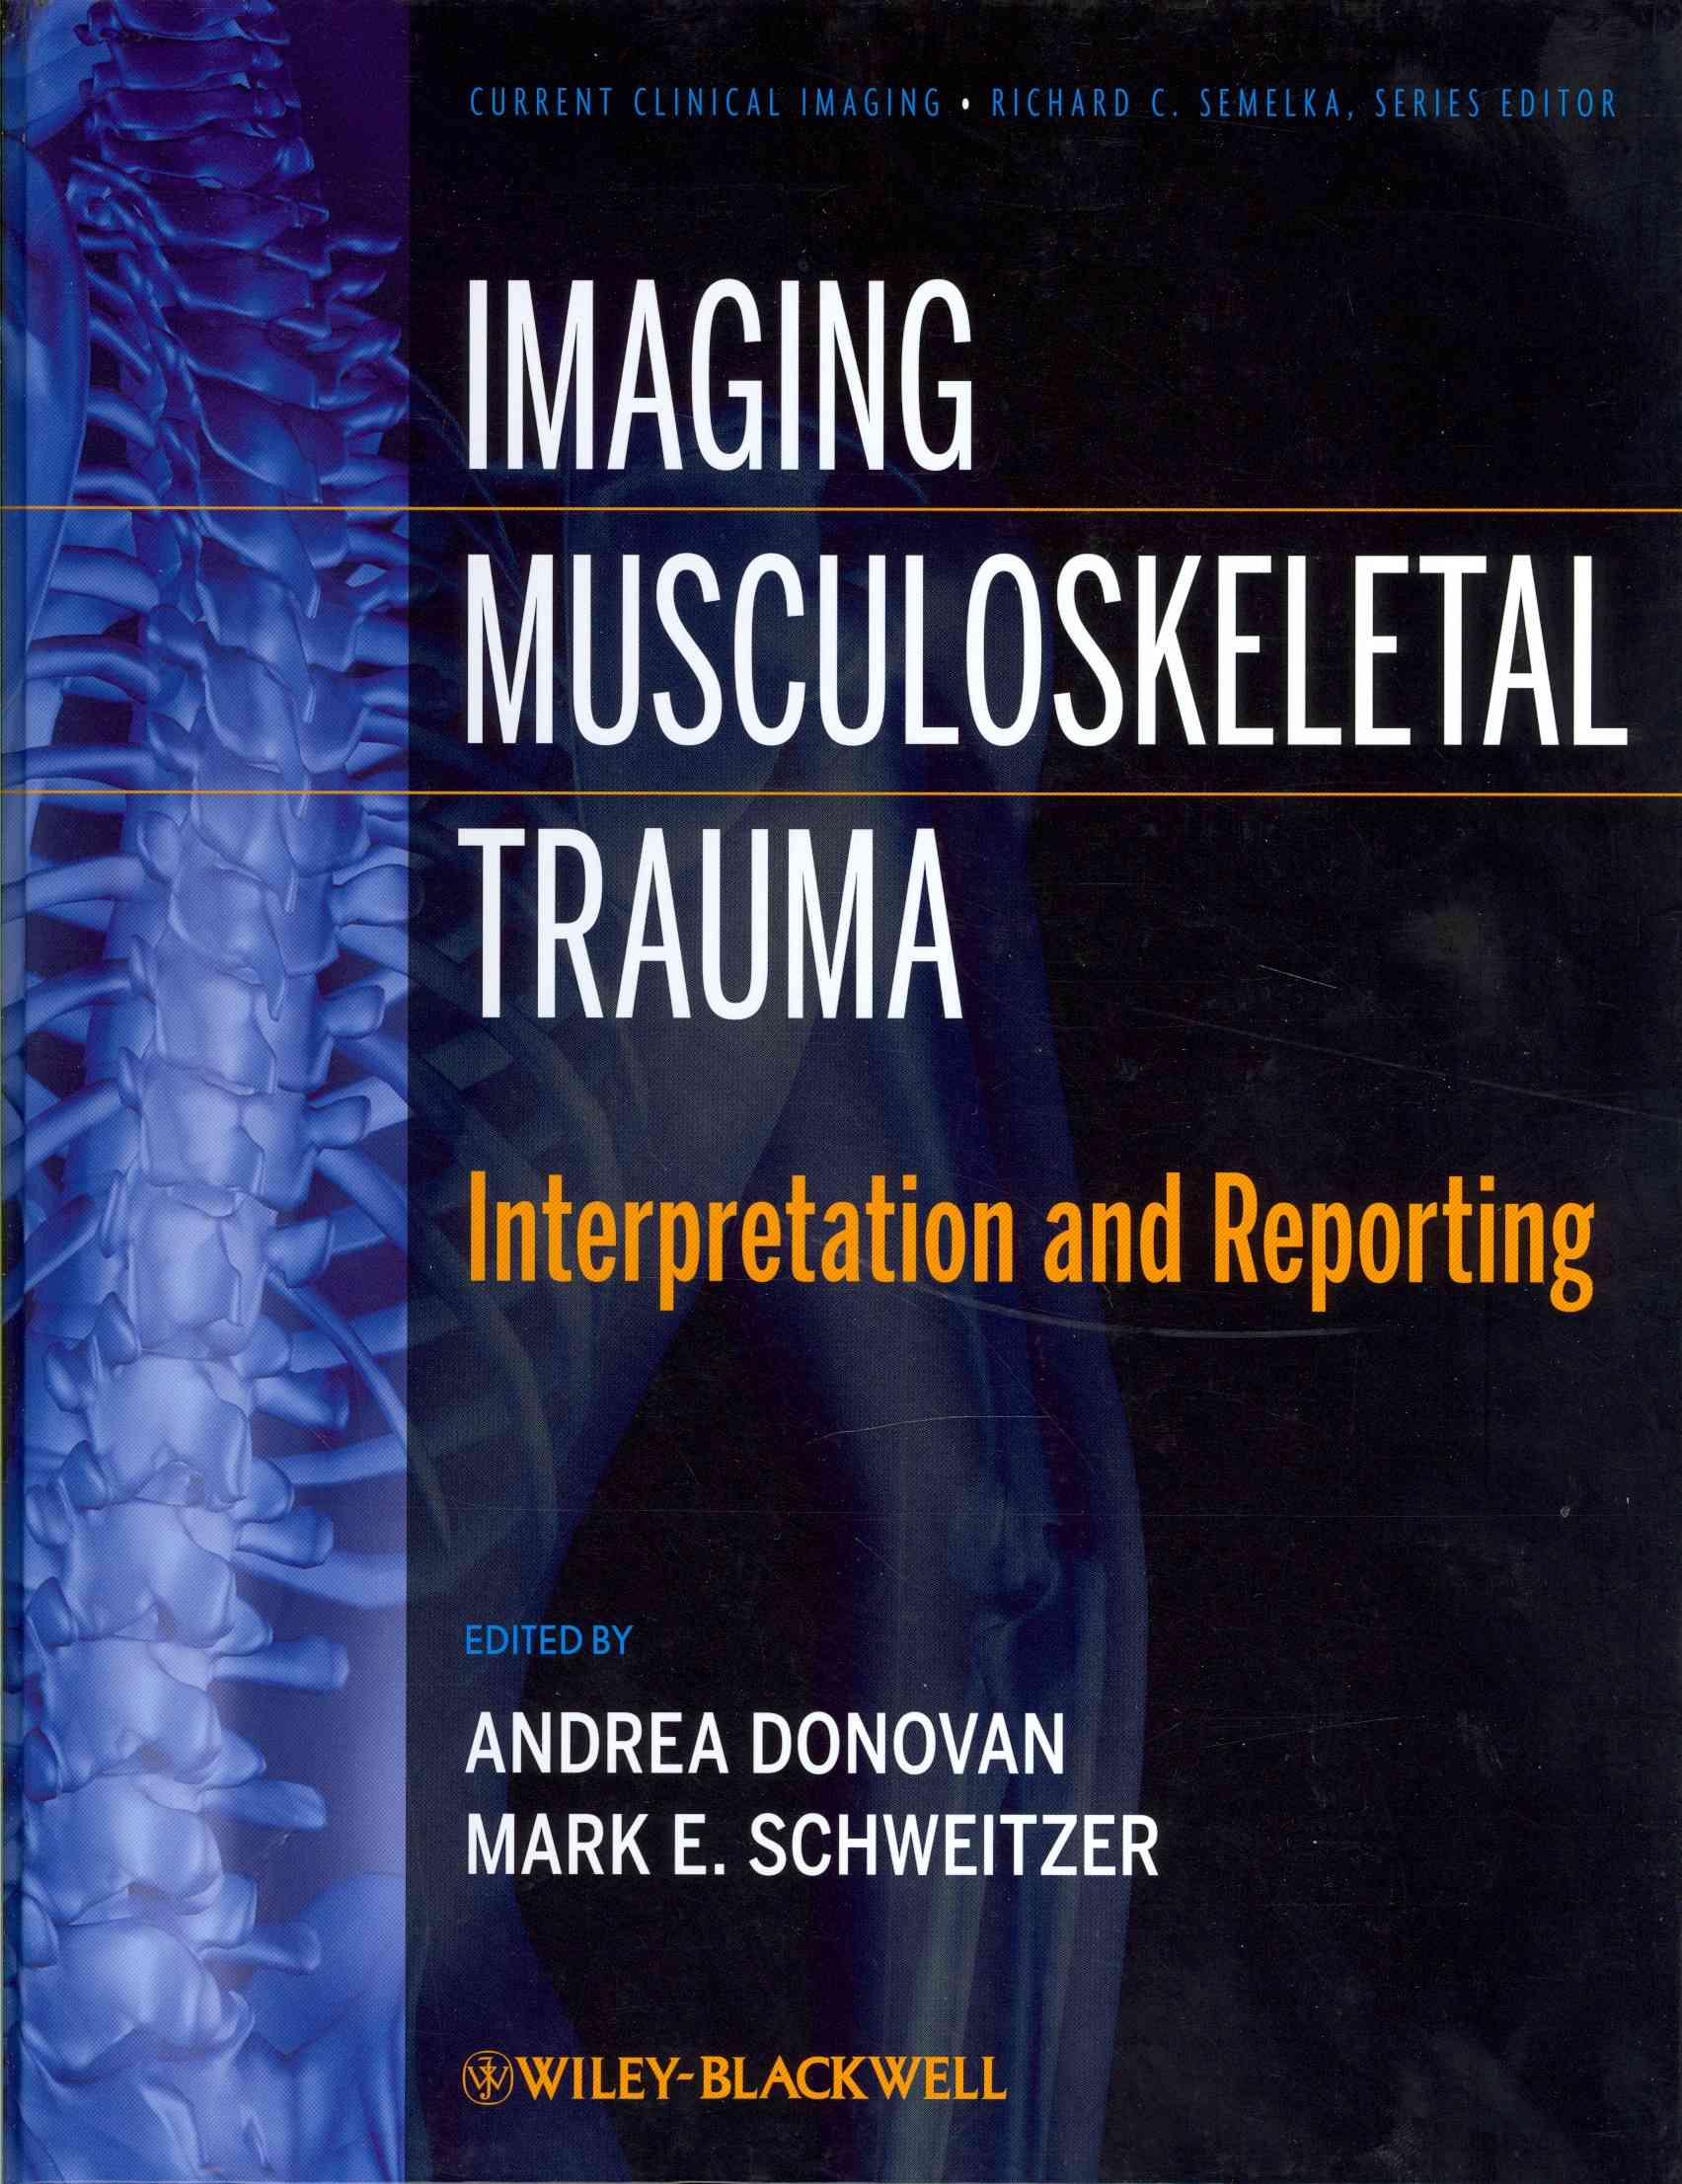 Imaging Musculoskeletal Trauma: Interpretation and Reporting (Hardcover)